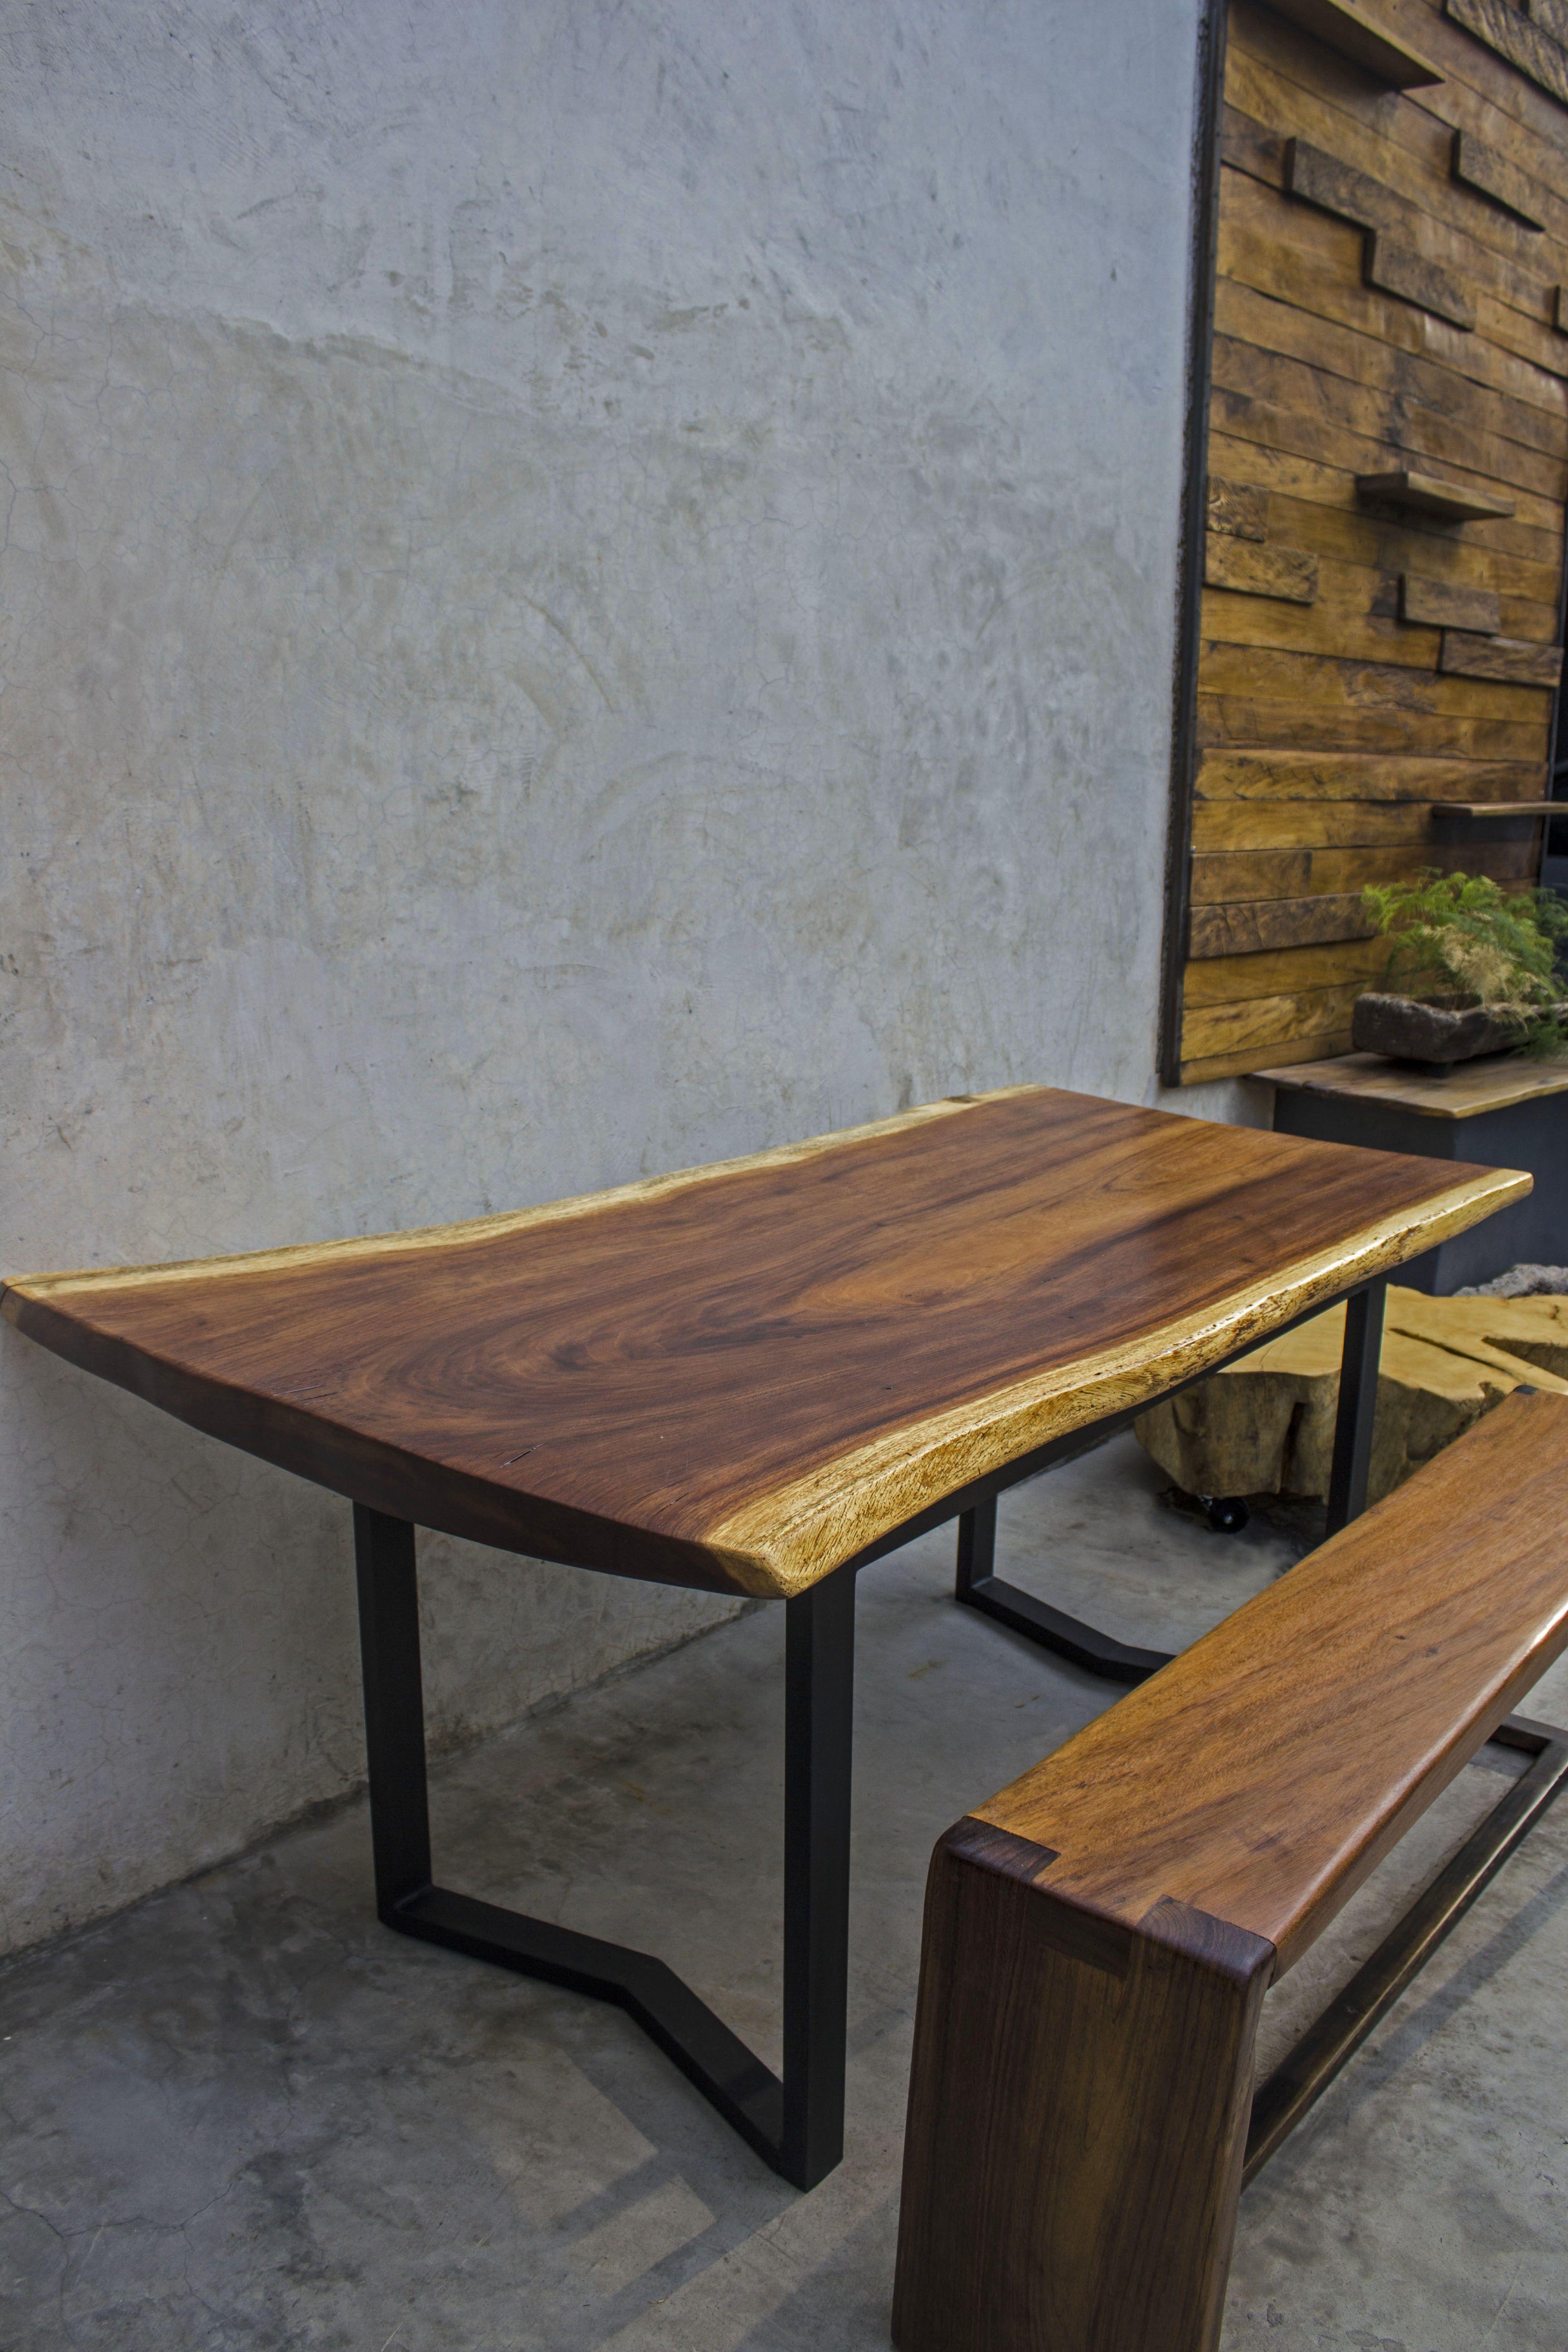 Peek Muebles Selectos - Wood Table Parota Peek Muebles Selectos Comedor Comedores [mjhdah]https://i.pinimg.com/originals/b7/69/98/b7699833bf579ddbb57e3479b248e4aa.jpg